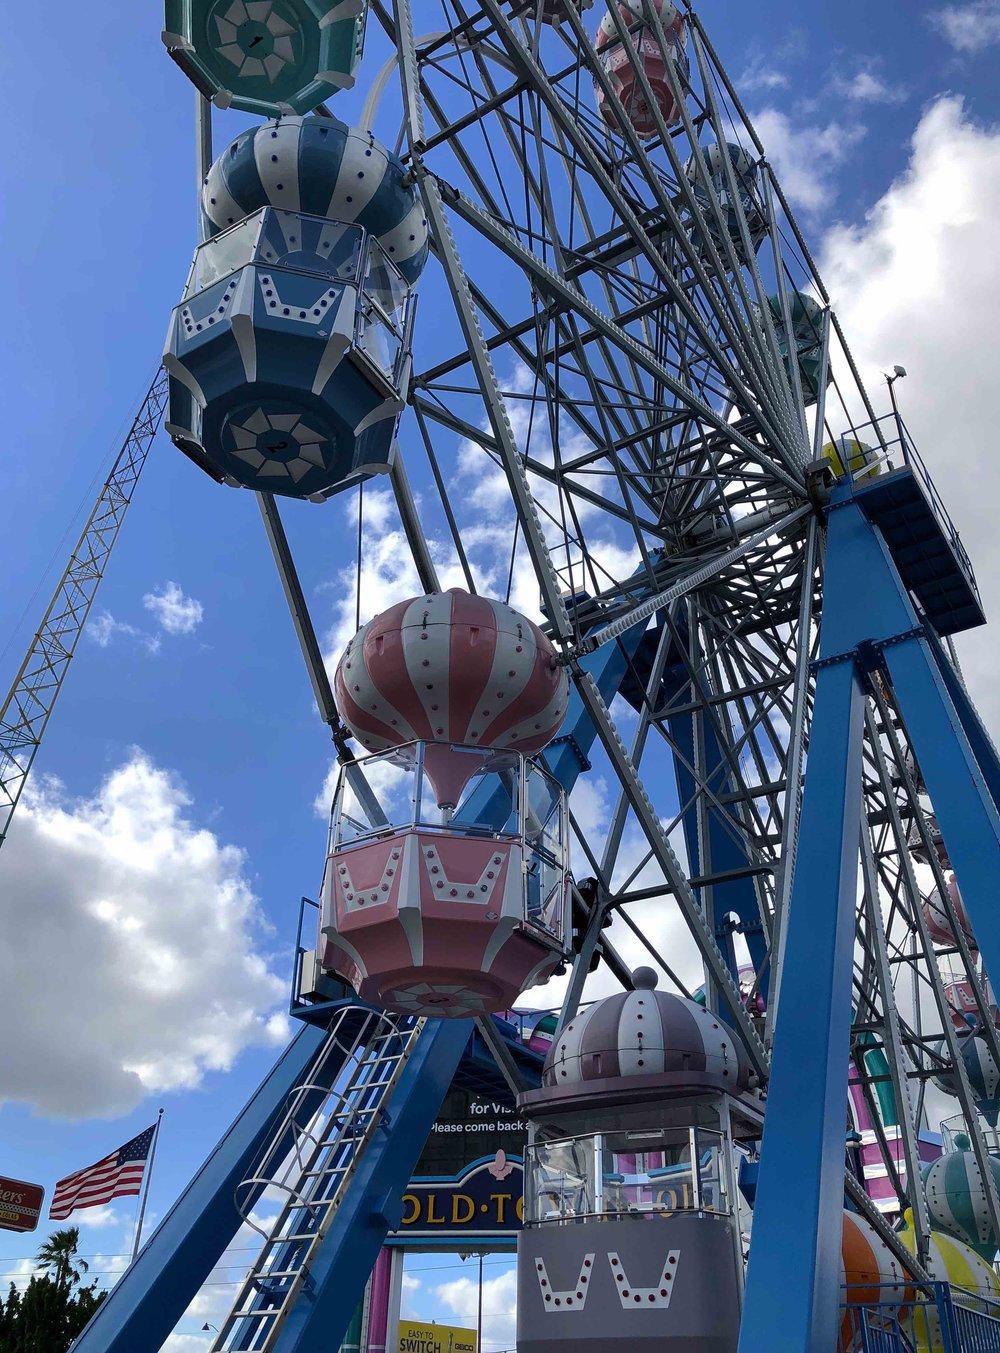 Ferris wheel, Old Town Kissimmee